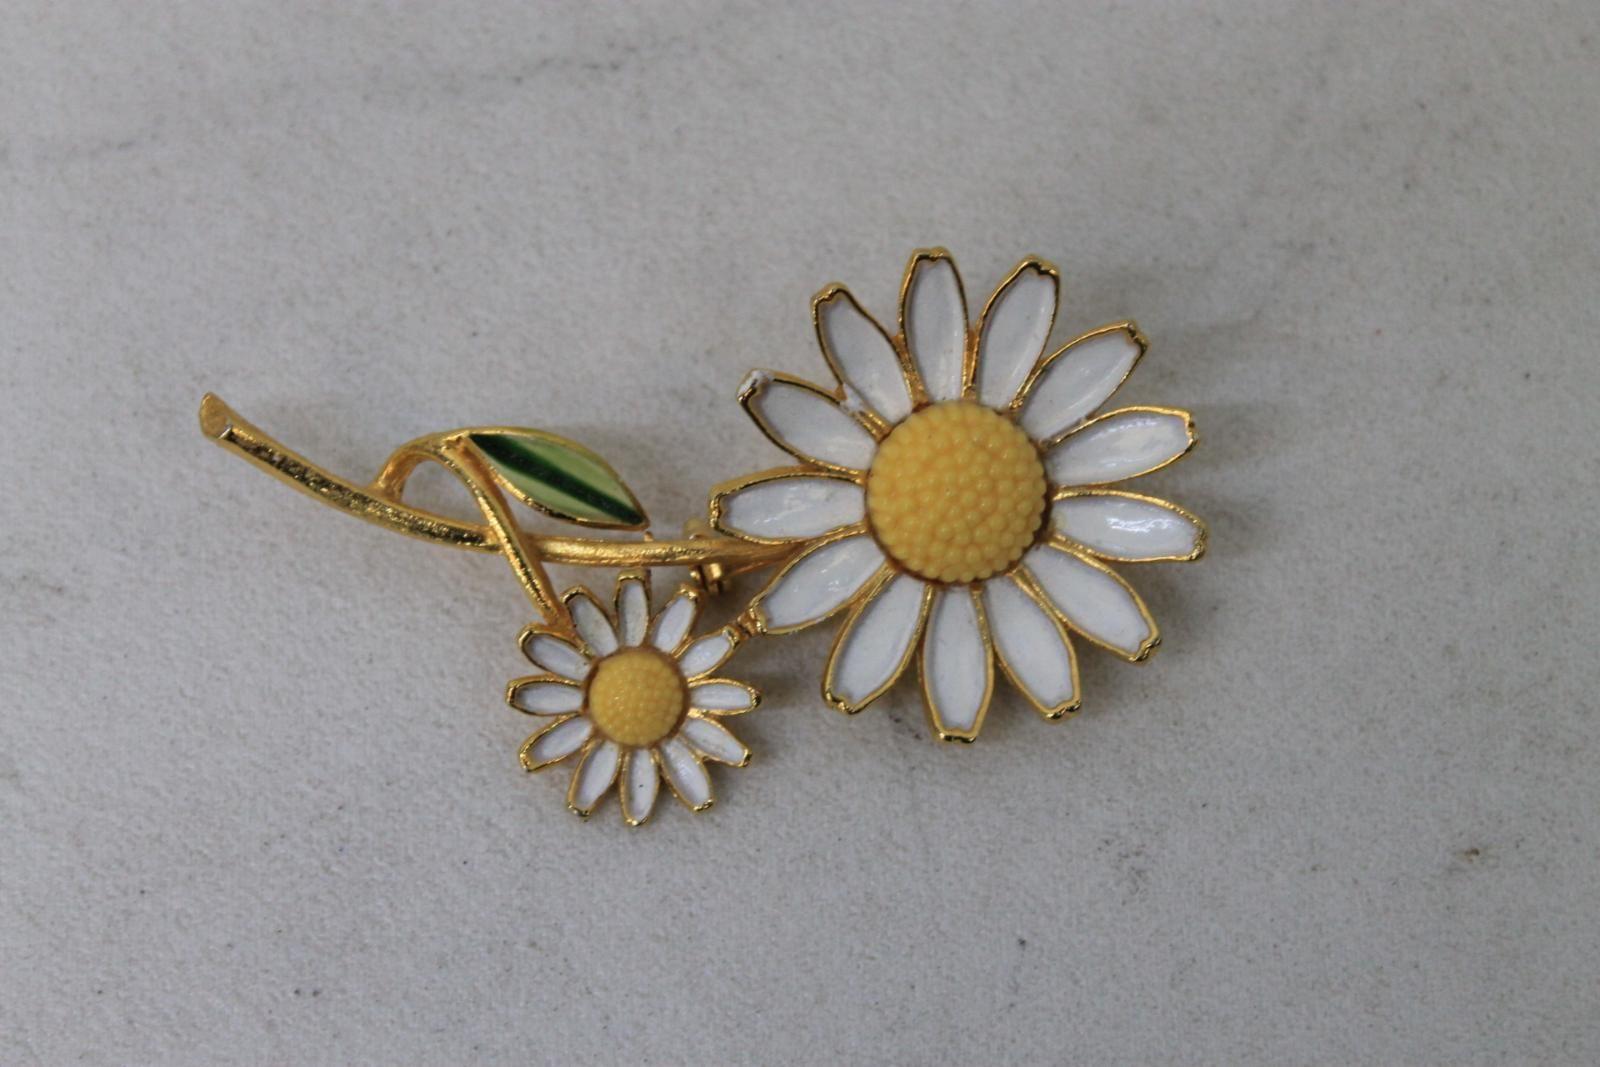 WEISS-Ladies-Vintage-Golden-Designer-Daisy-Flower-Metal-Brooch-Lapel-Pin